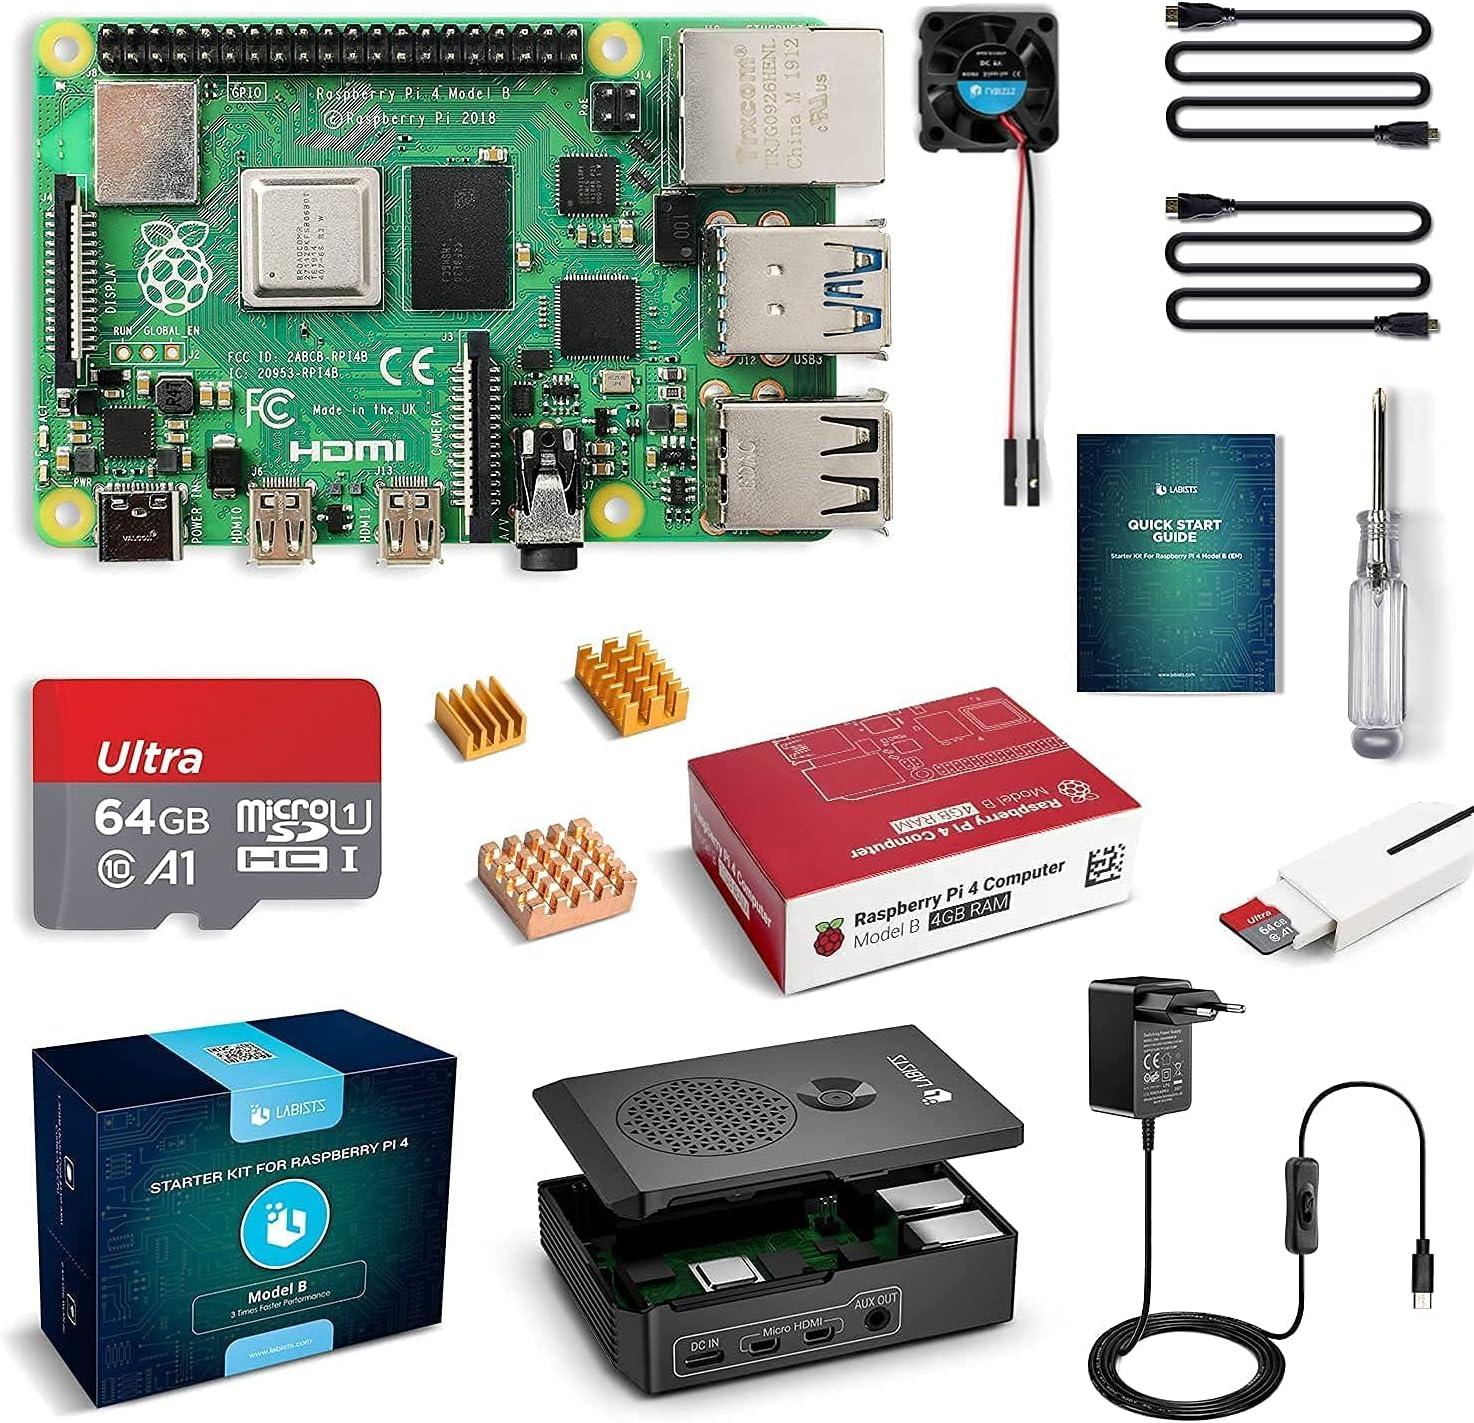 Raspberry Pi 4 4GB RAM con Tarjeta SD de 64GB Precargada con Raspberry Pi OS, Cable 5V 3A con On/Off, 2 Micro HDMI, 3 Disipadores de Calor, Ventilador, Caja Negra y Lector de Tarjetas